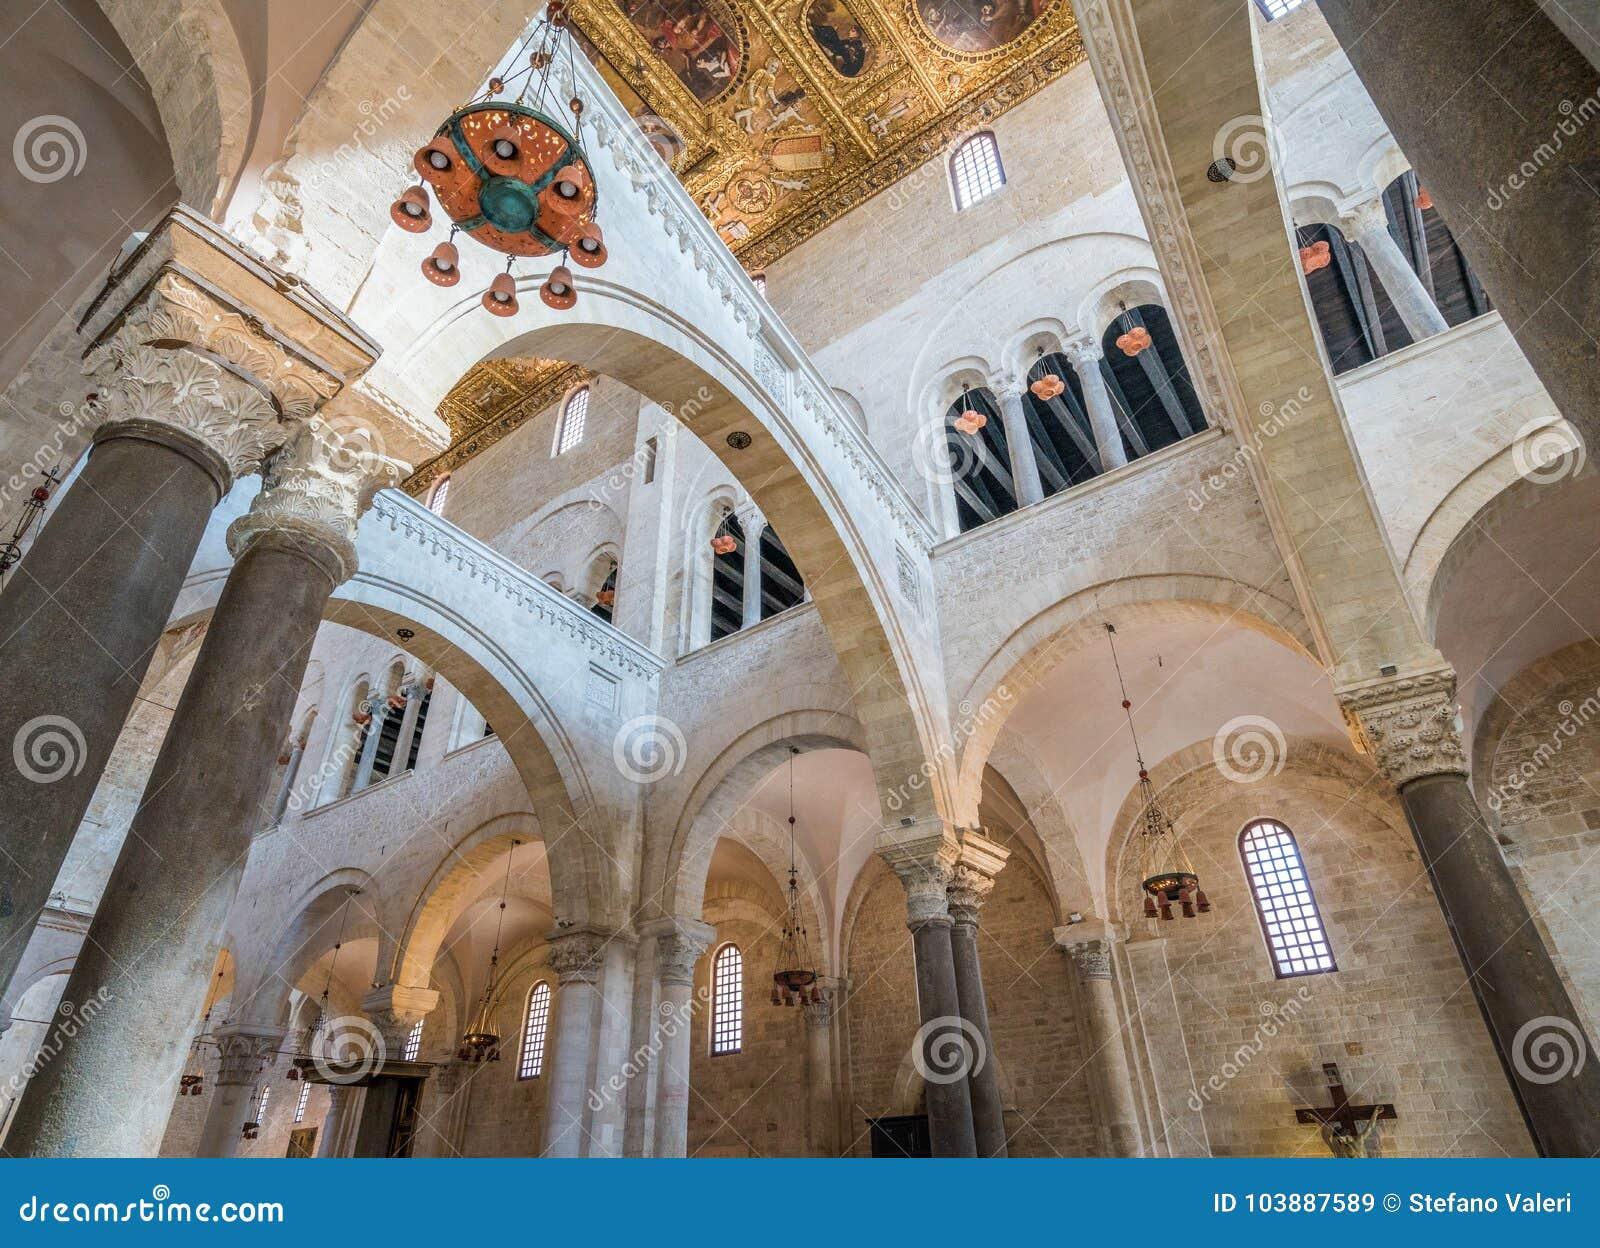 The Inside Of Saint Nicola Basilica In Bari, Apulia ...